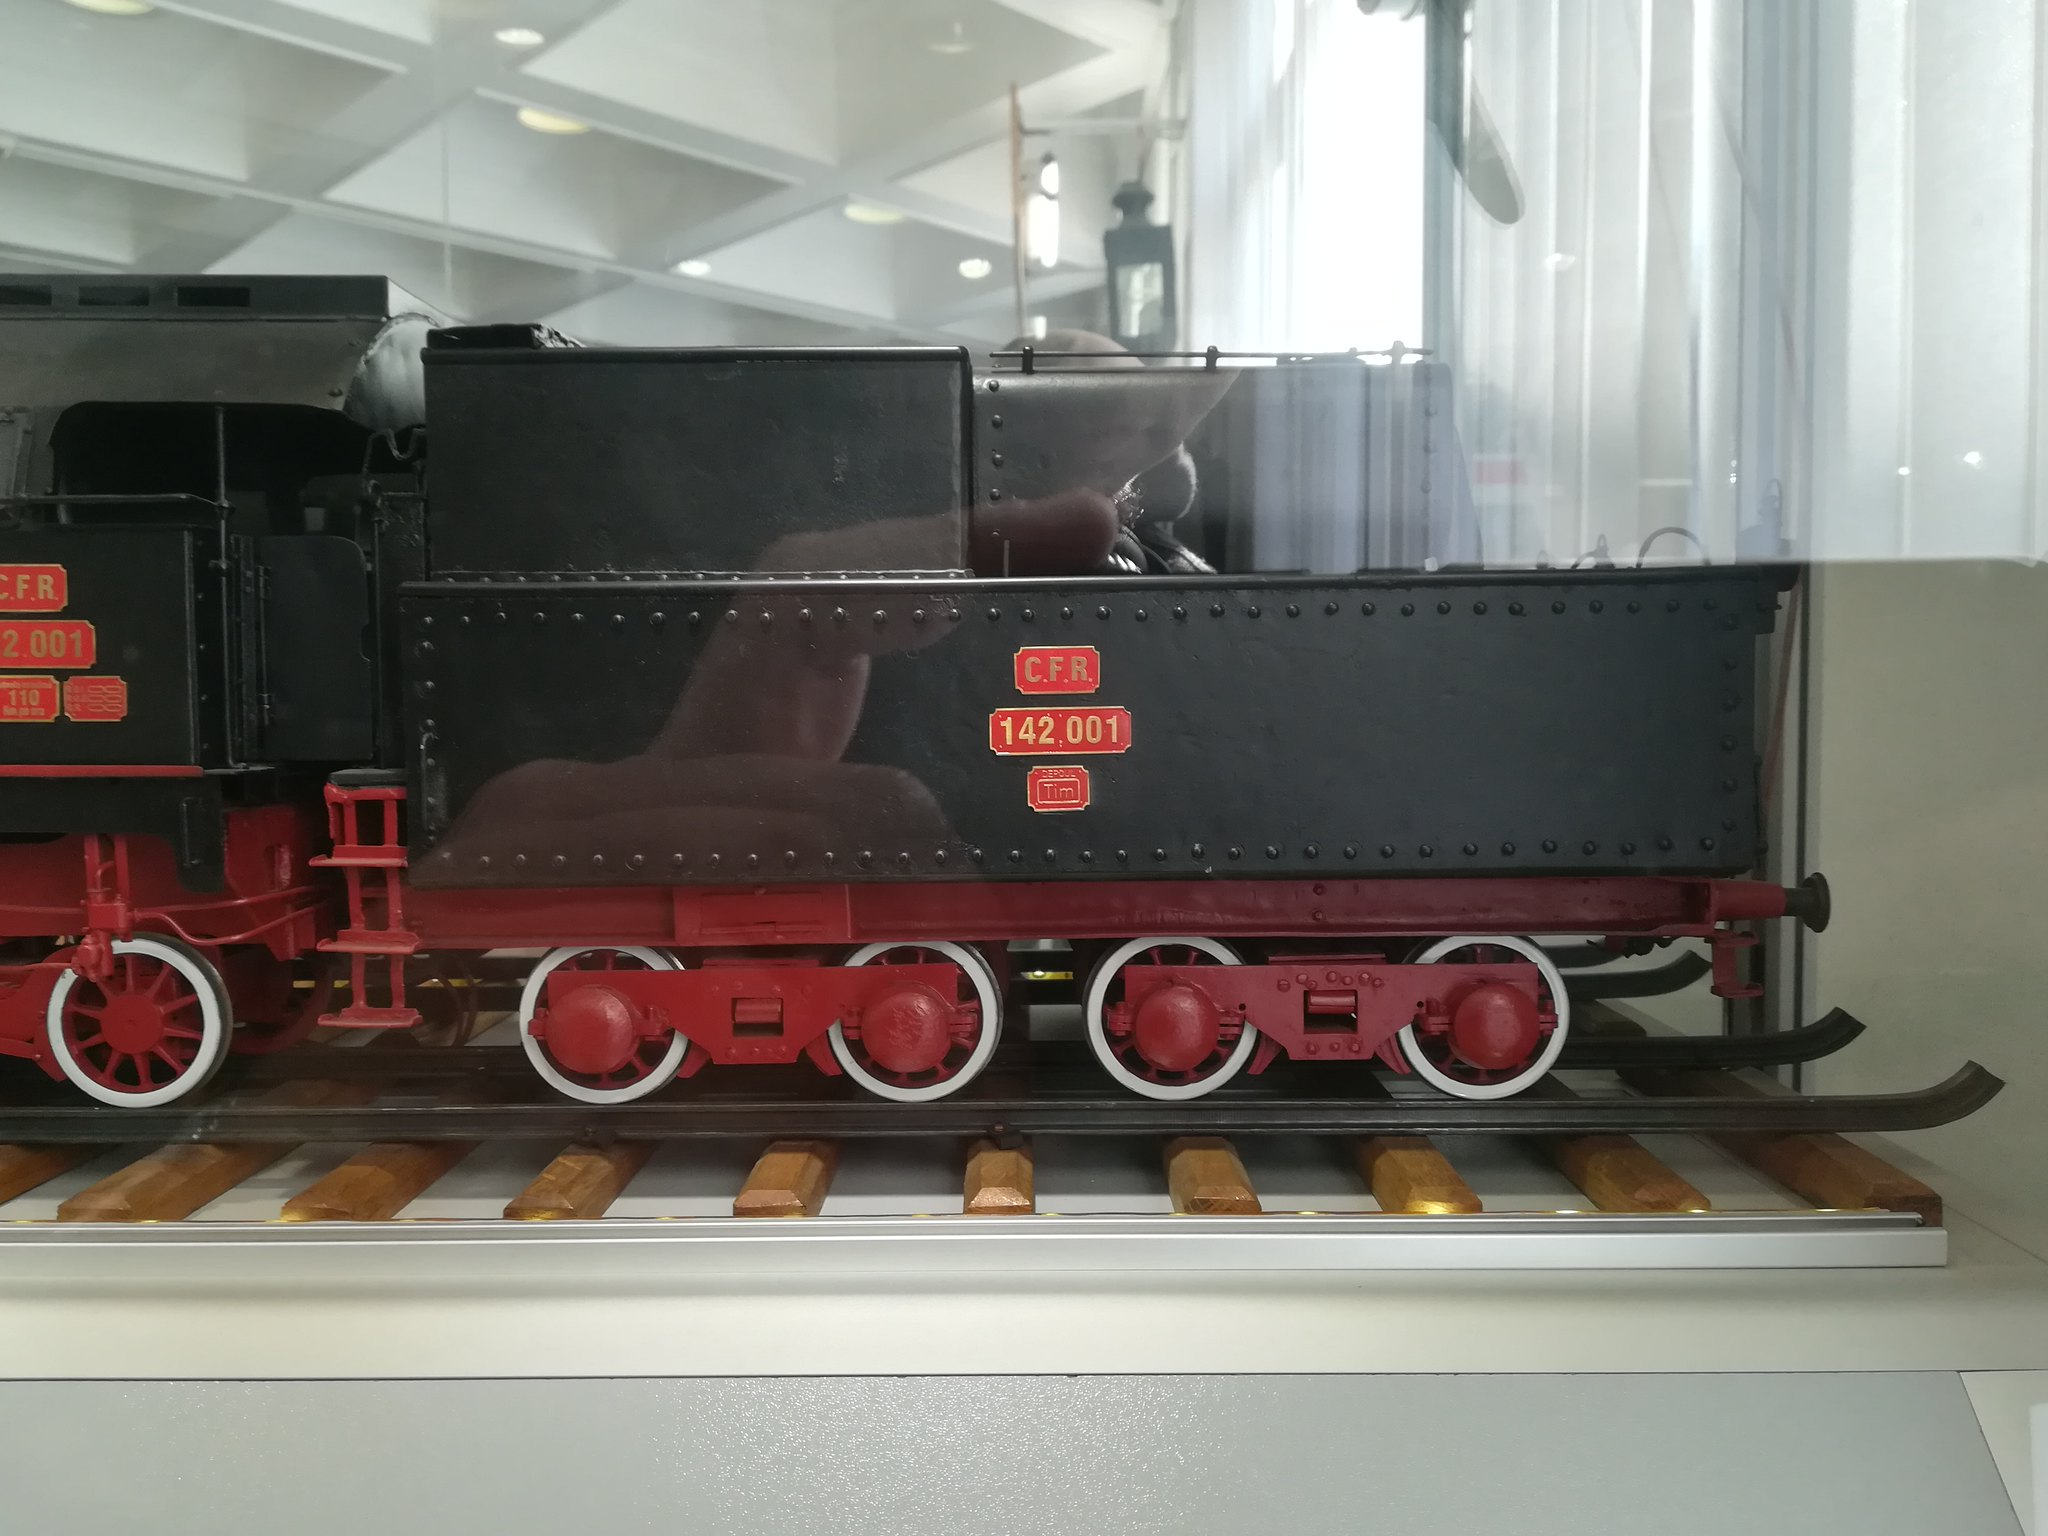 Reportaje feroviare Adirmvl - Pagina 21 49596223547_11c48b9382_k